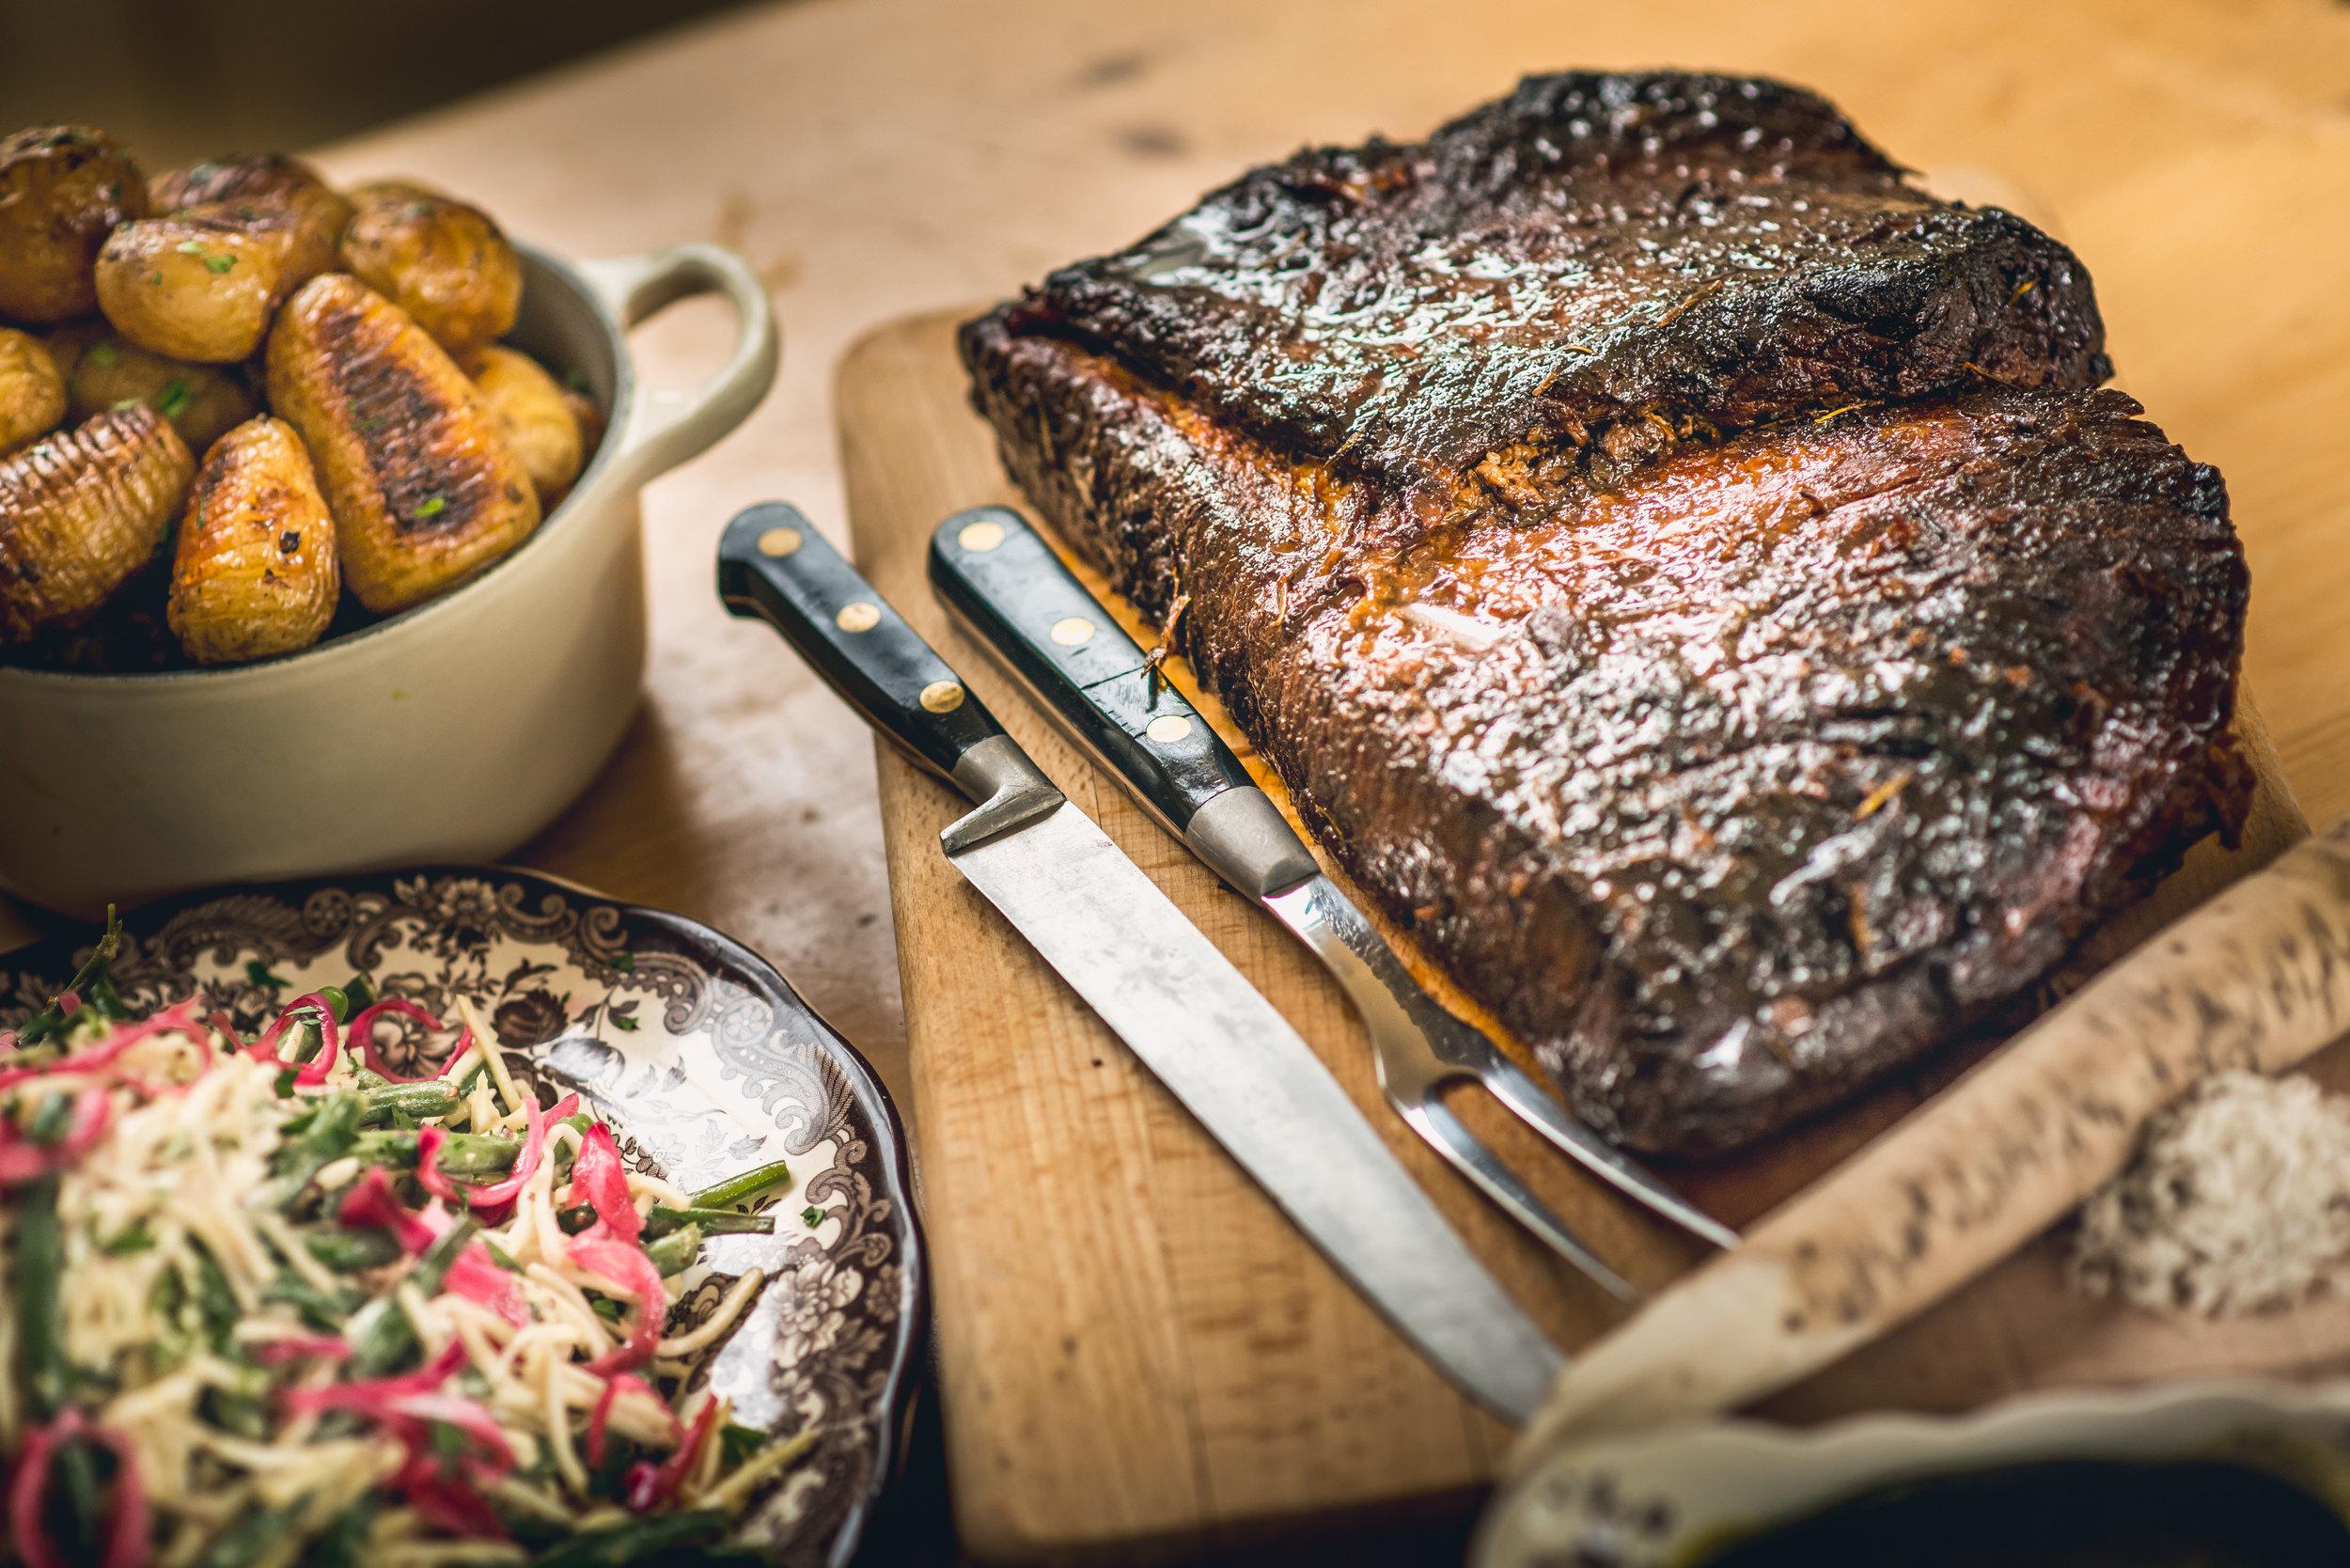 Braised Beef Brisket with Horseradish_2.jpg